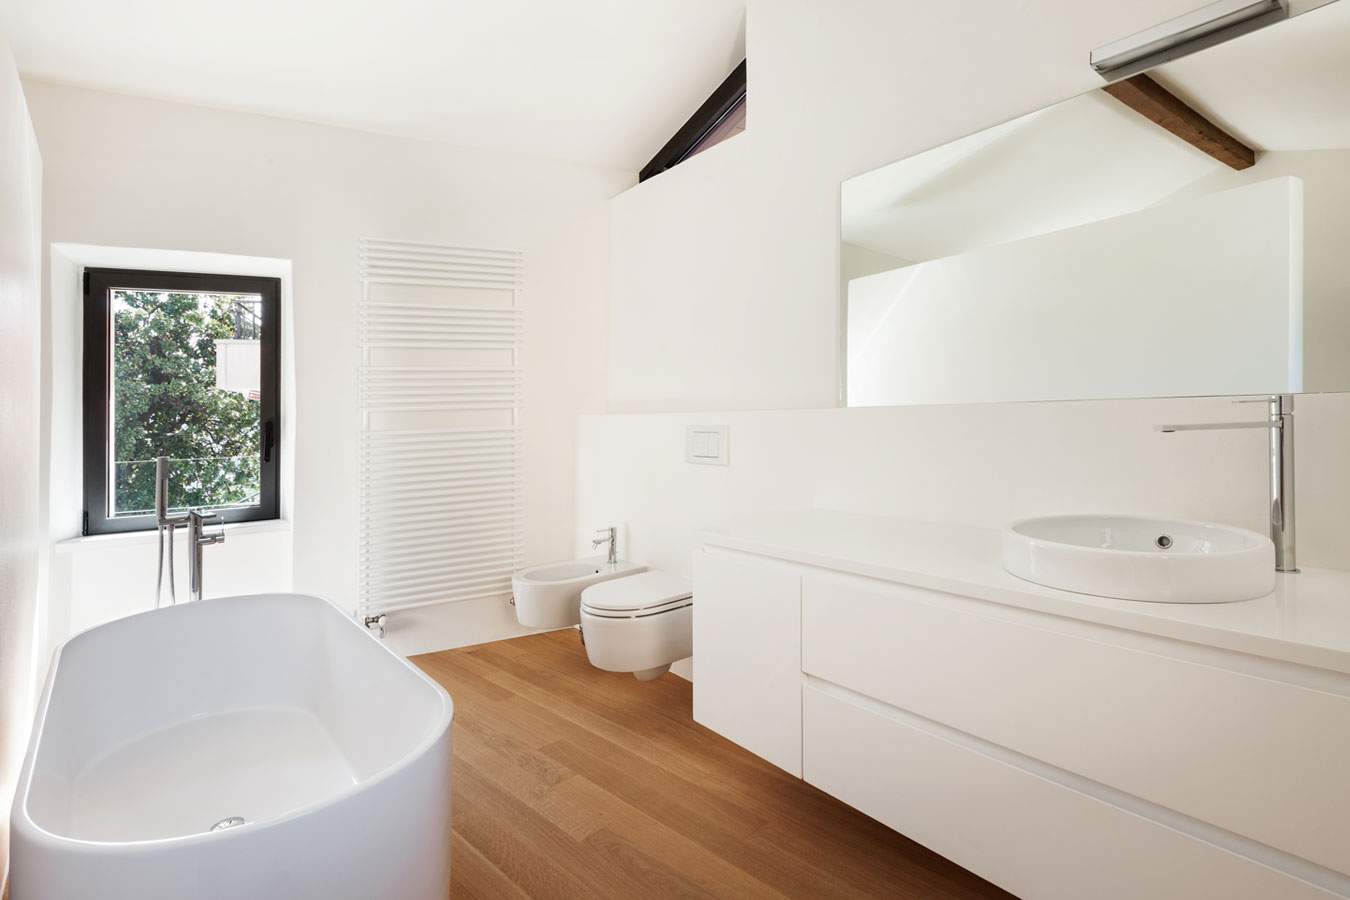 Stappenplan Woonkamer Inrichten : Stappenplan nieuwe badkamer thomas gaspersz